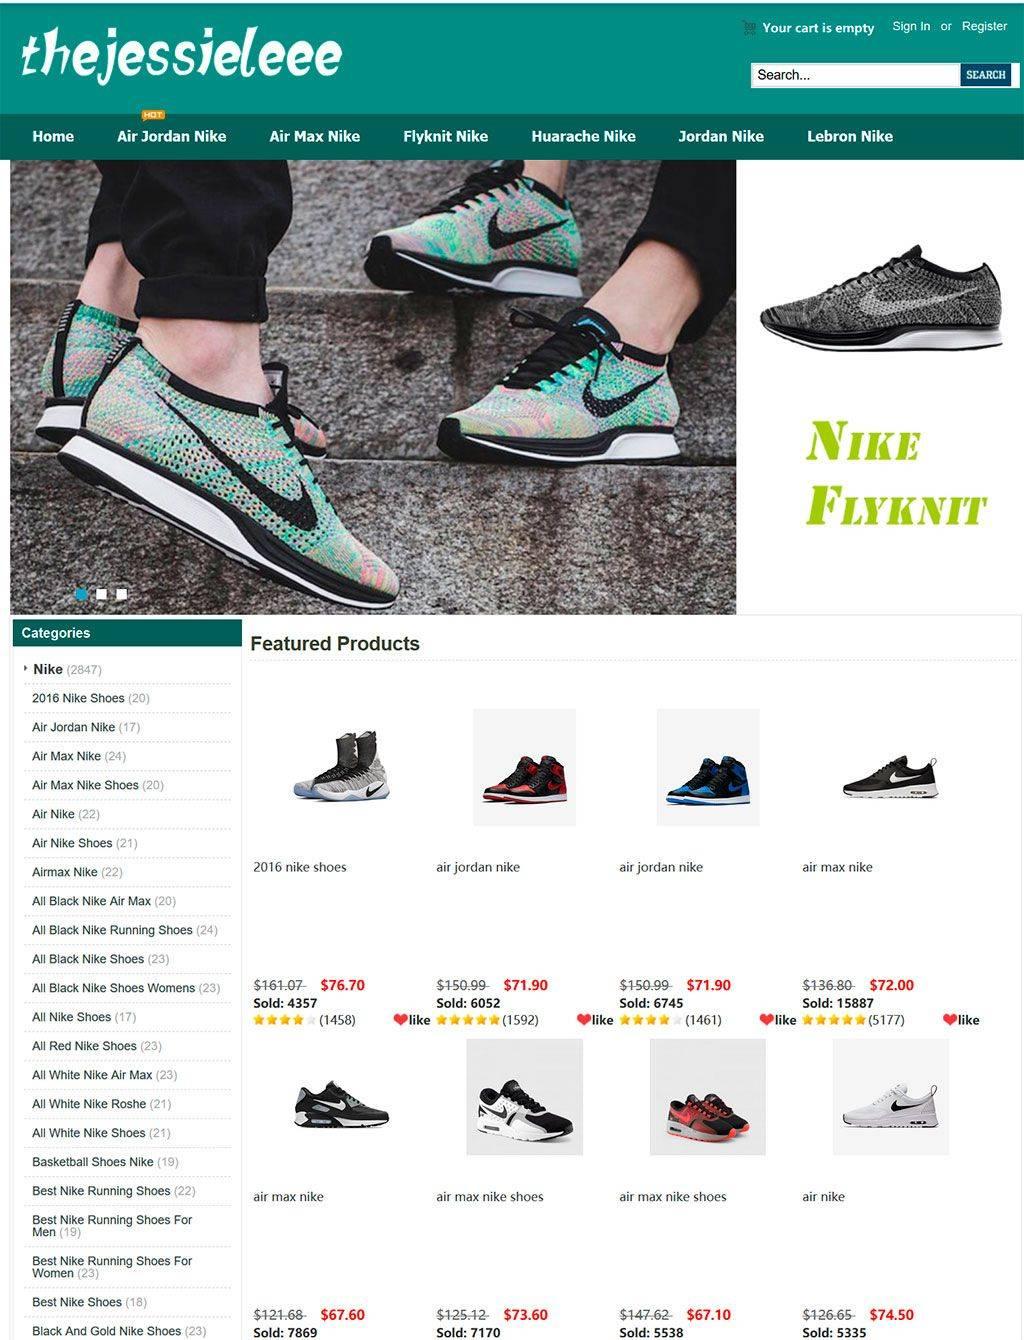 Thejessieleee.com Tienda Online Falsa Zapatillas Nike